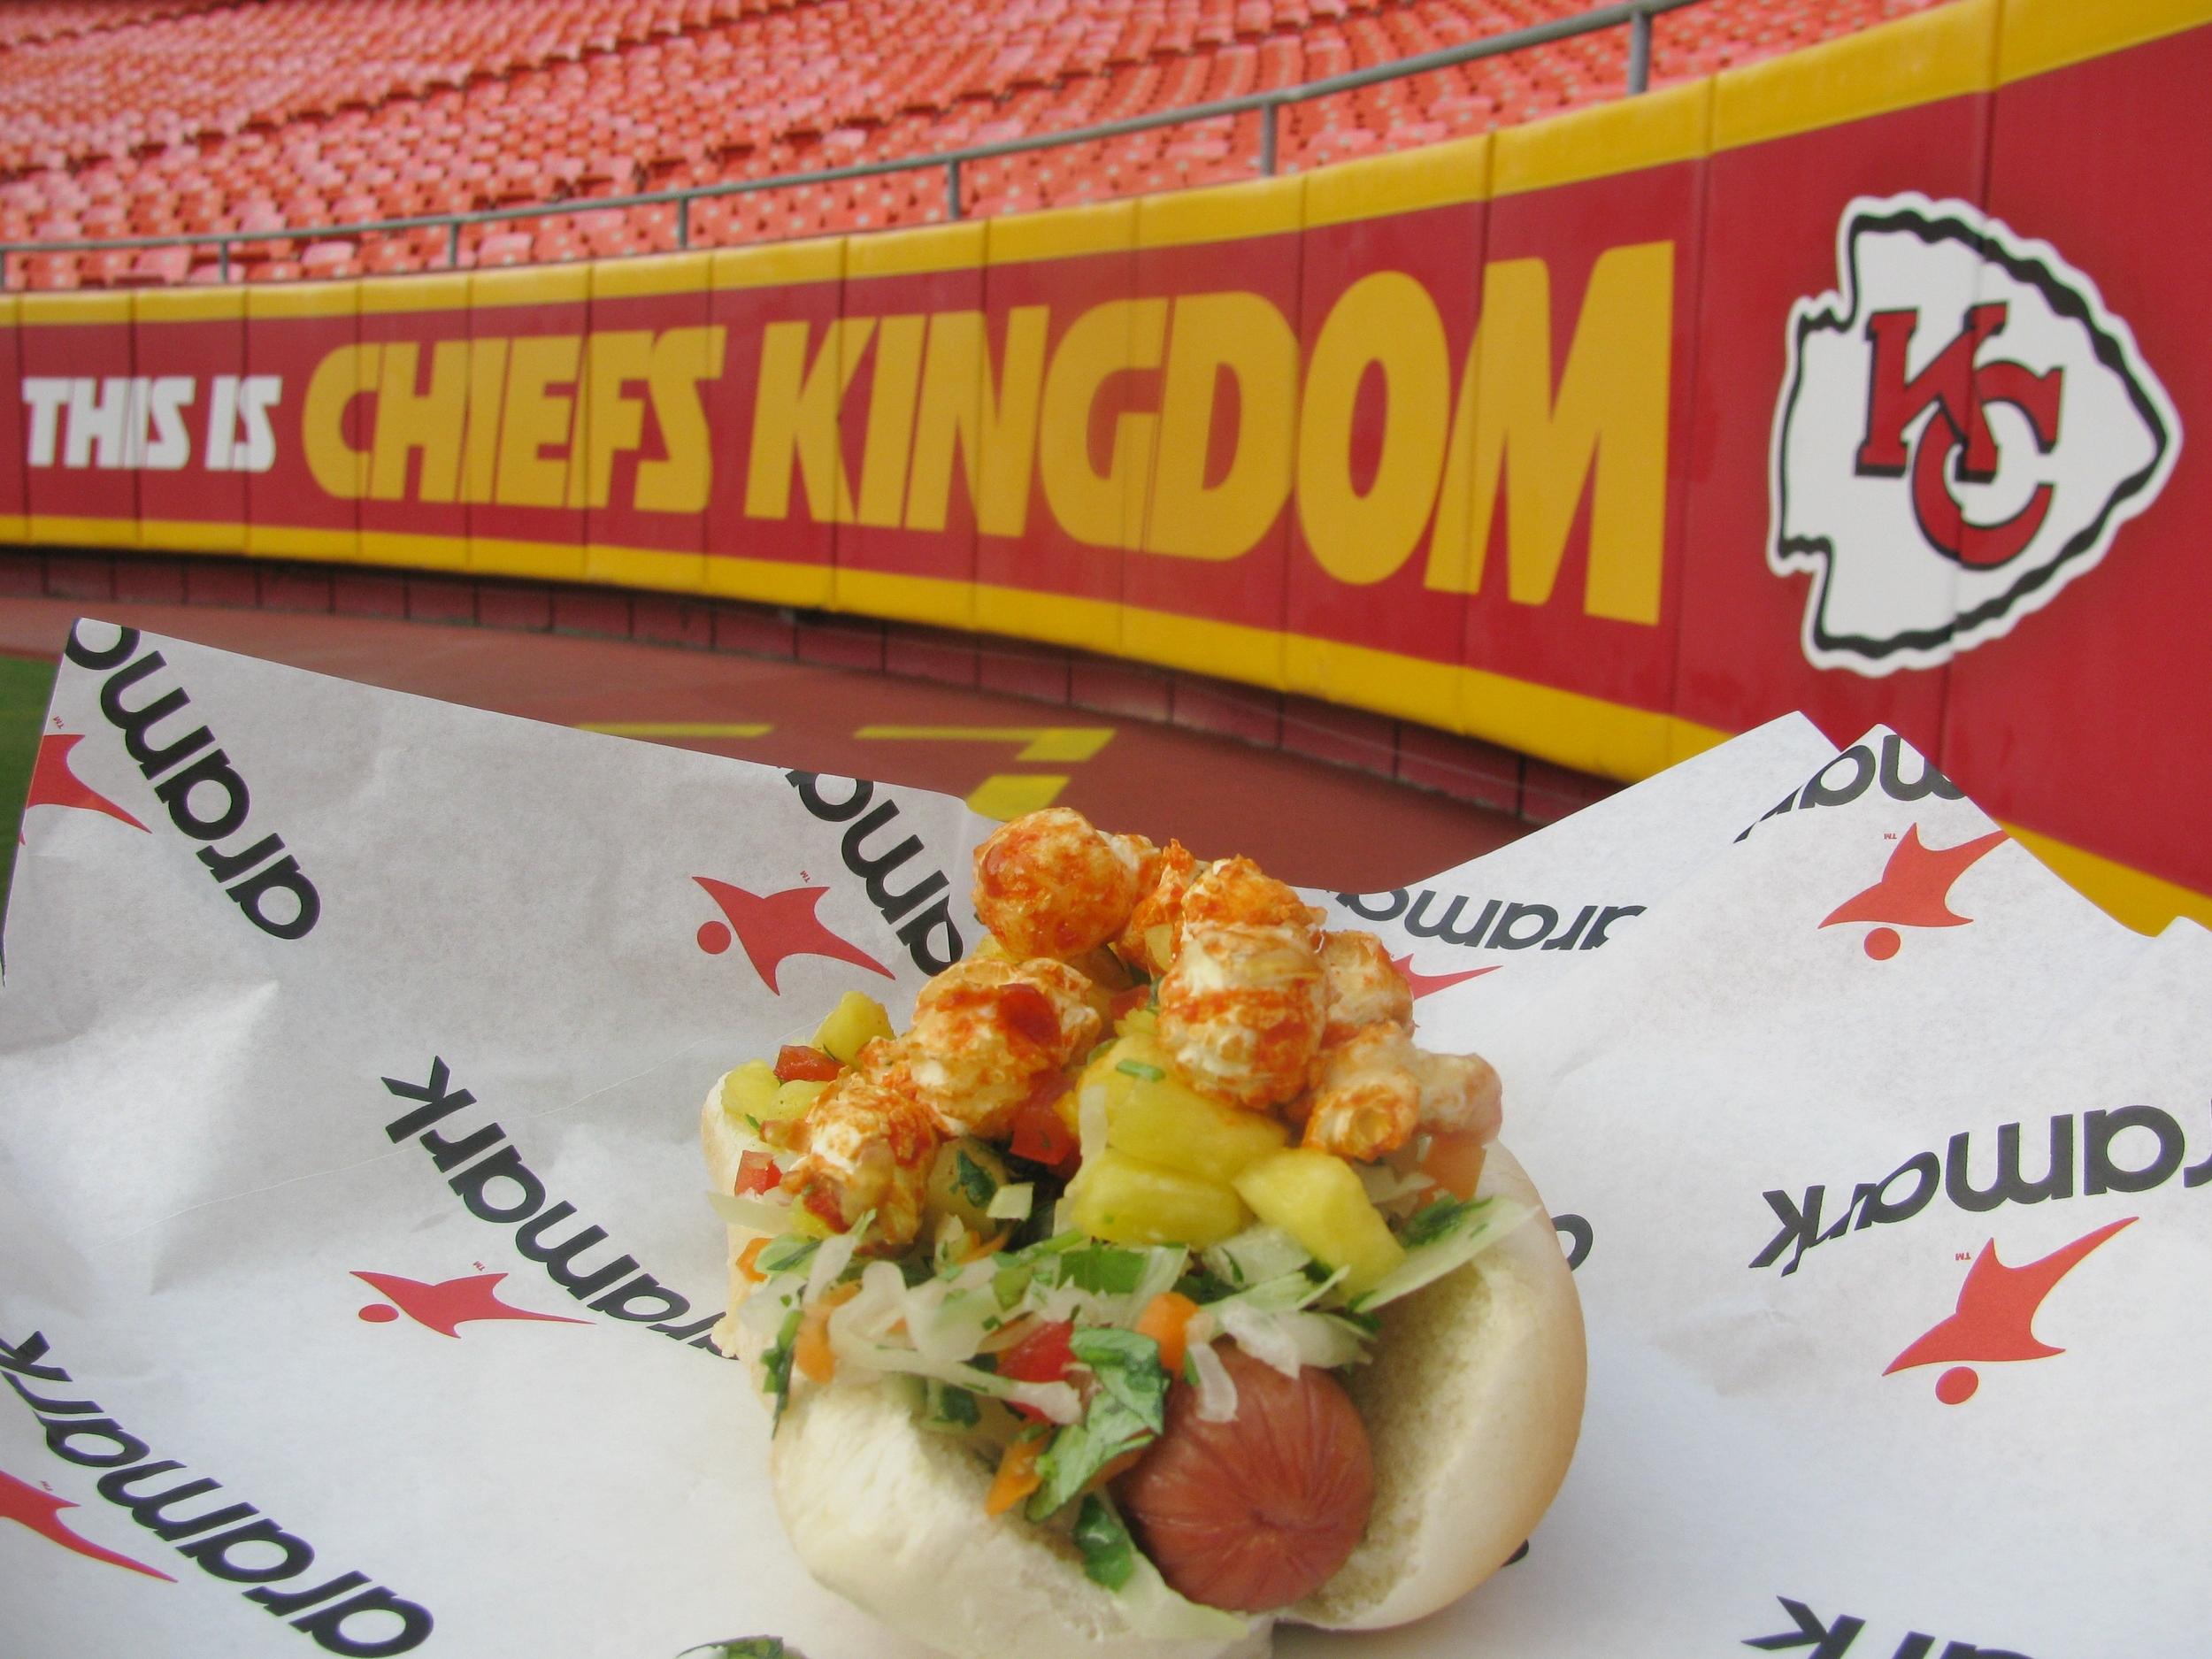 Sweet and Spicy Dog 1 - Arrowhead Stadium.jpg